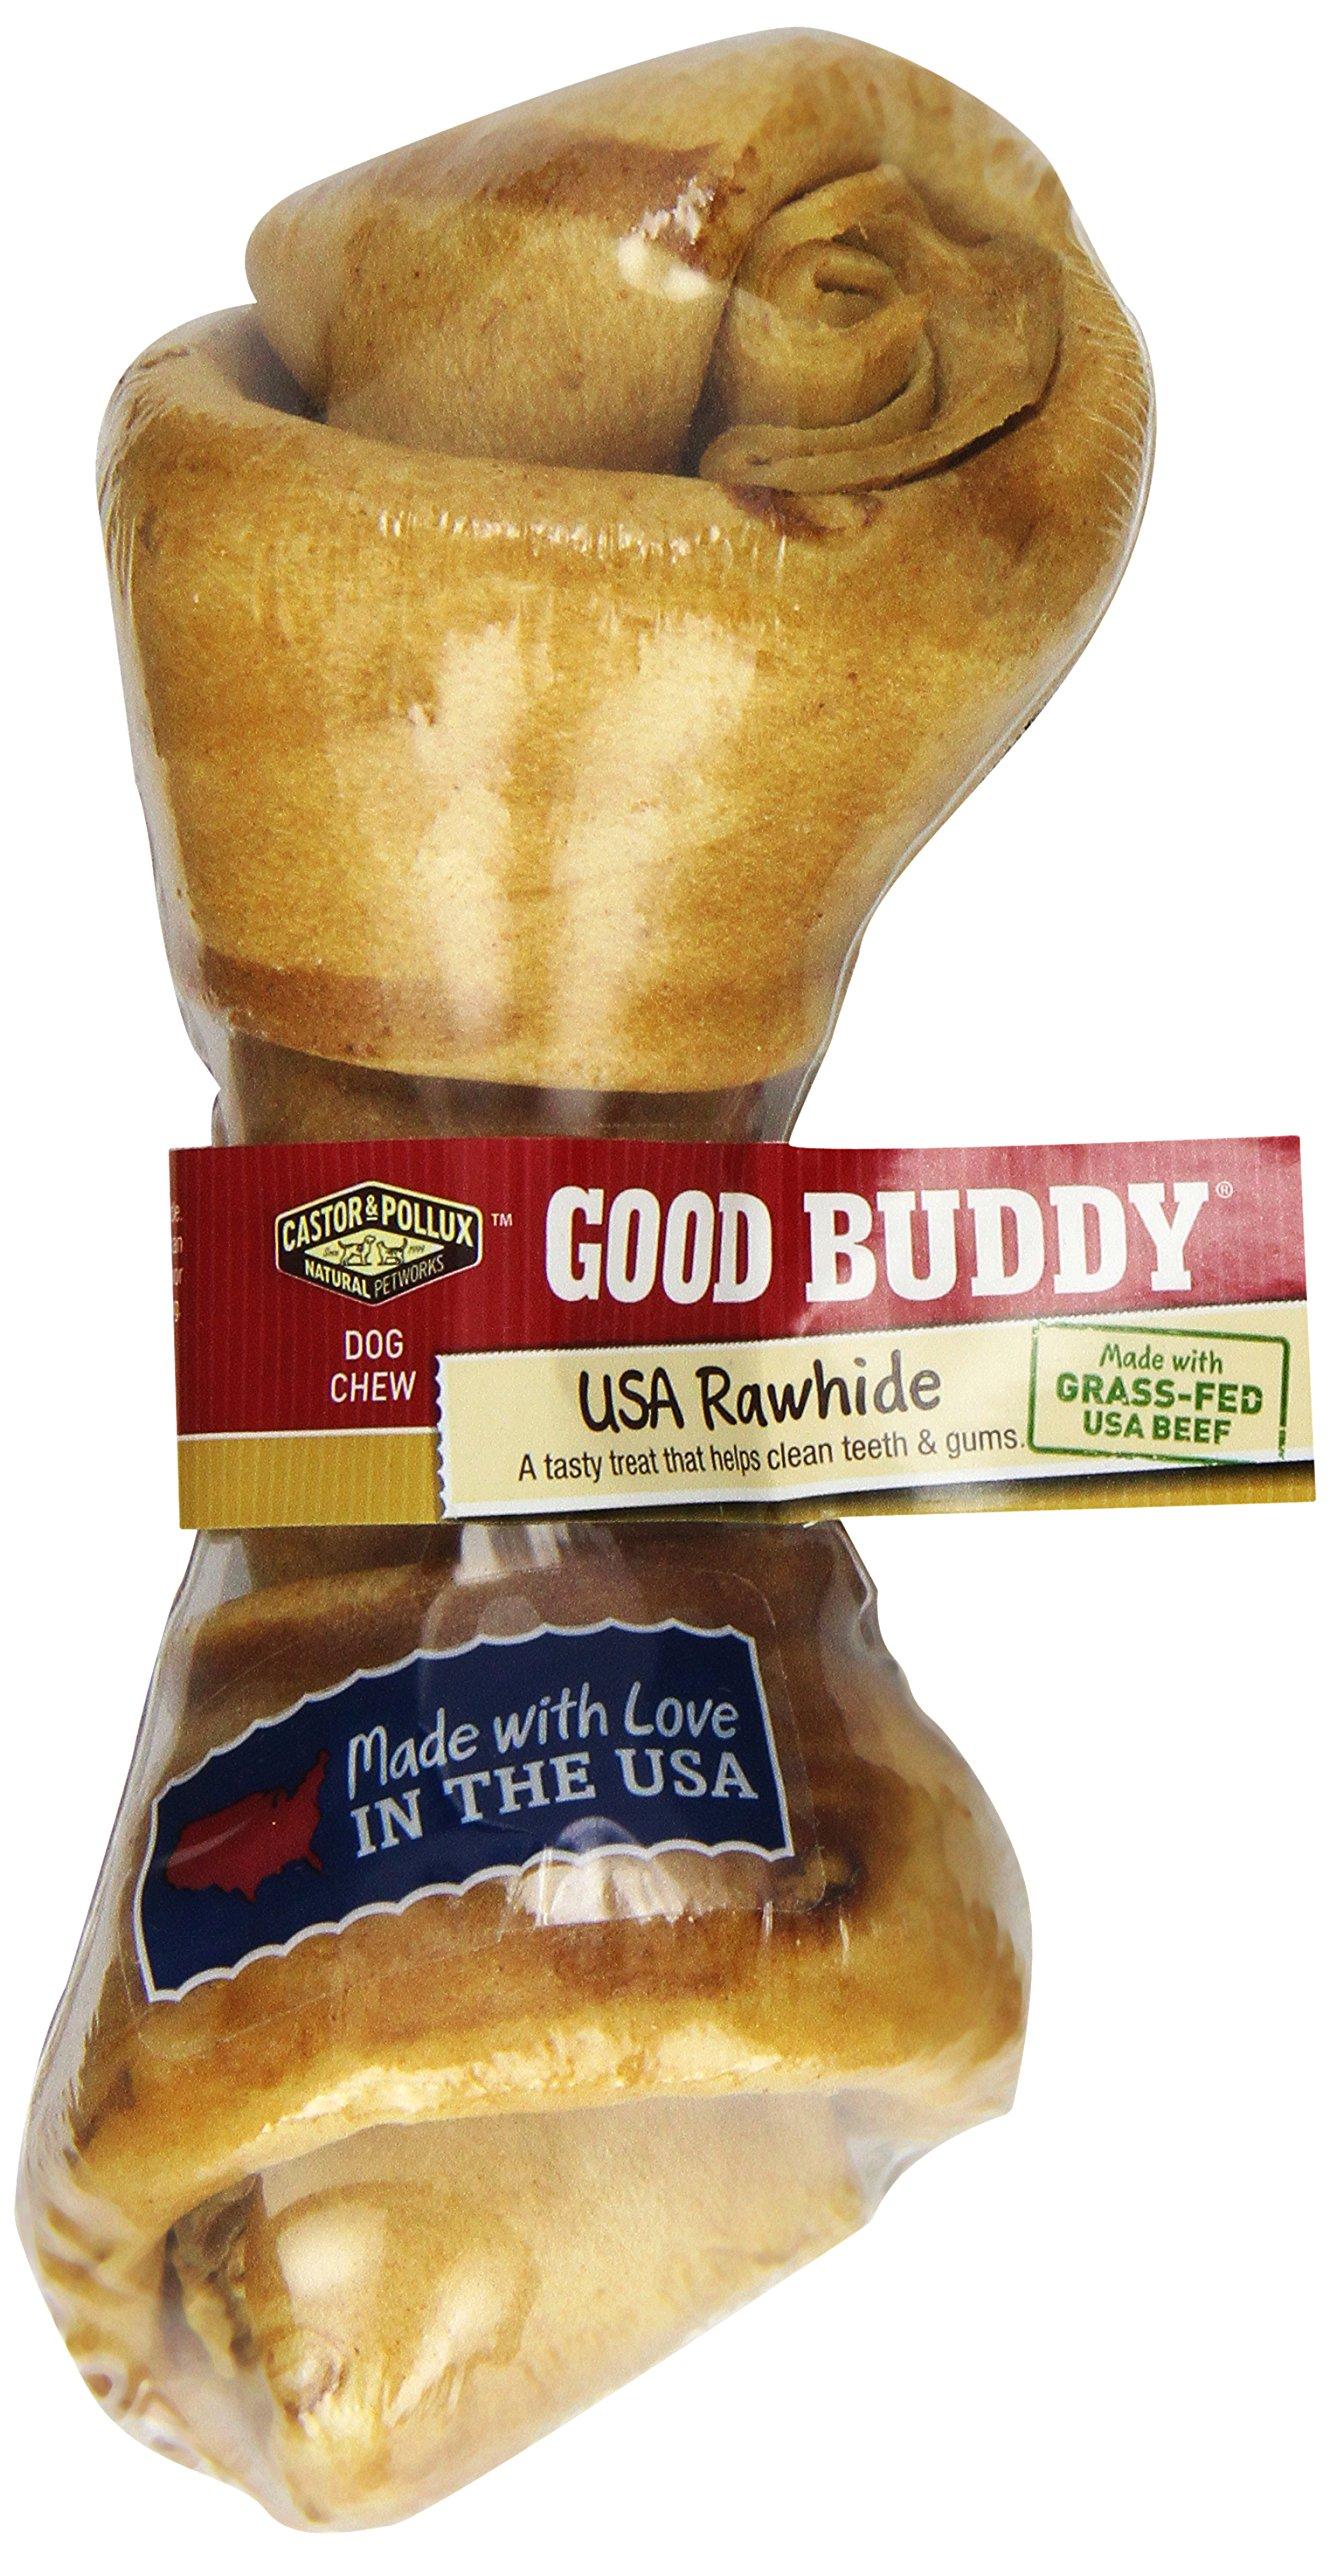 Castor & Pollux Good Buddy USA Rawhide Bone, One 6-7 Inch Bone (Pack of 12)